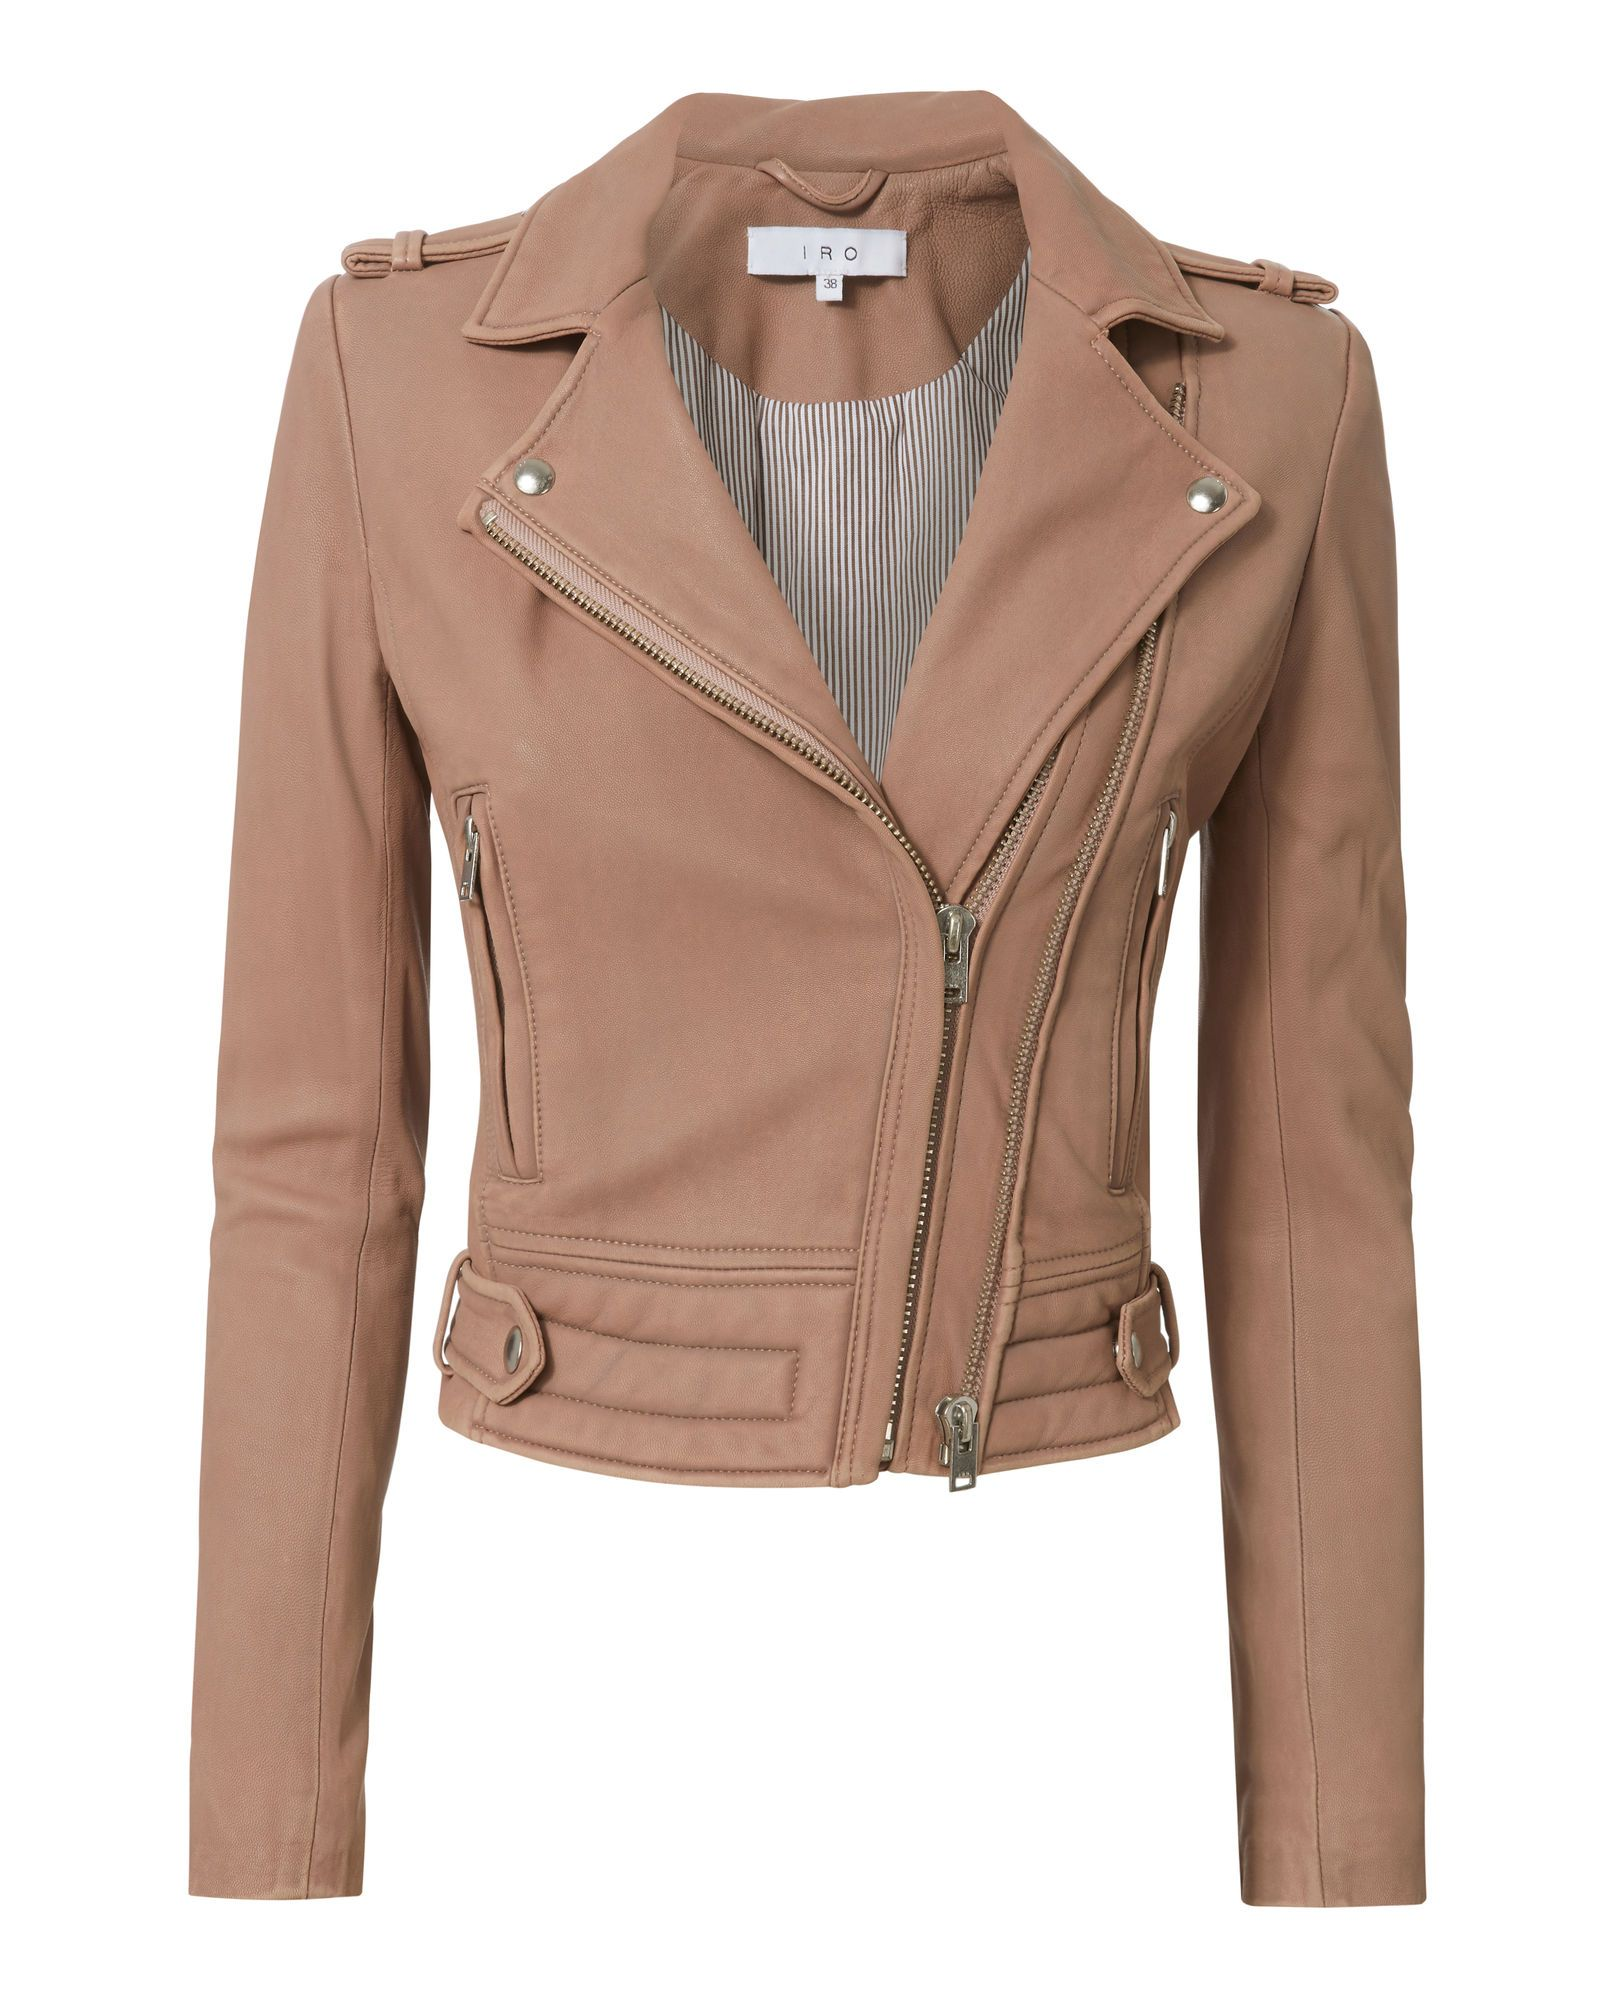 Luiga Pink Leather Cropped Moto Jacket Cropped Leather Jacket Beige Leather Jacket Leather Jackets Women [ 2000 x 1601 Pixel ]